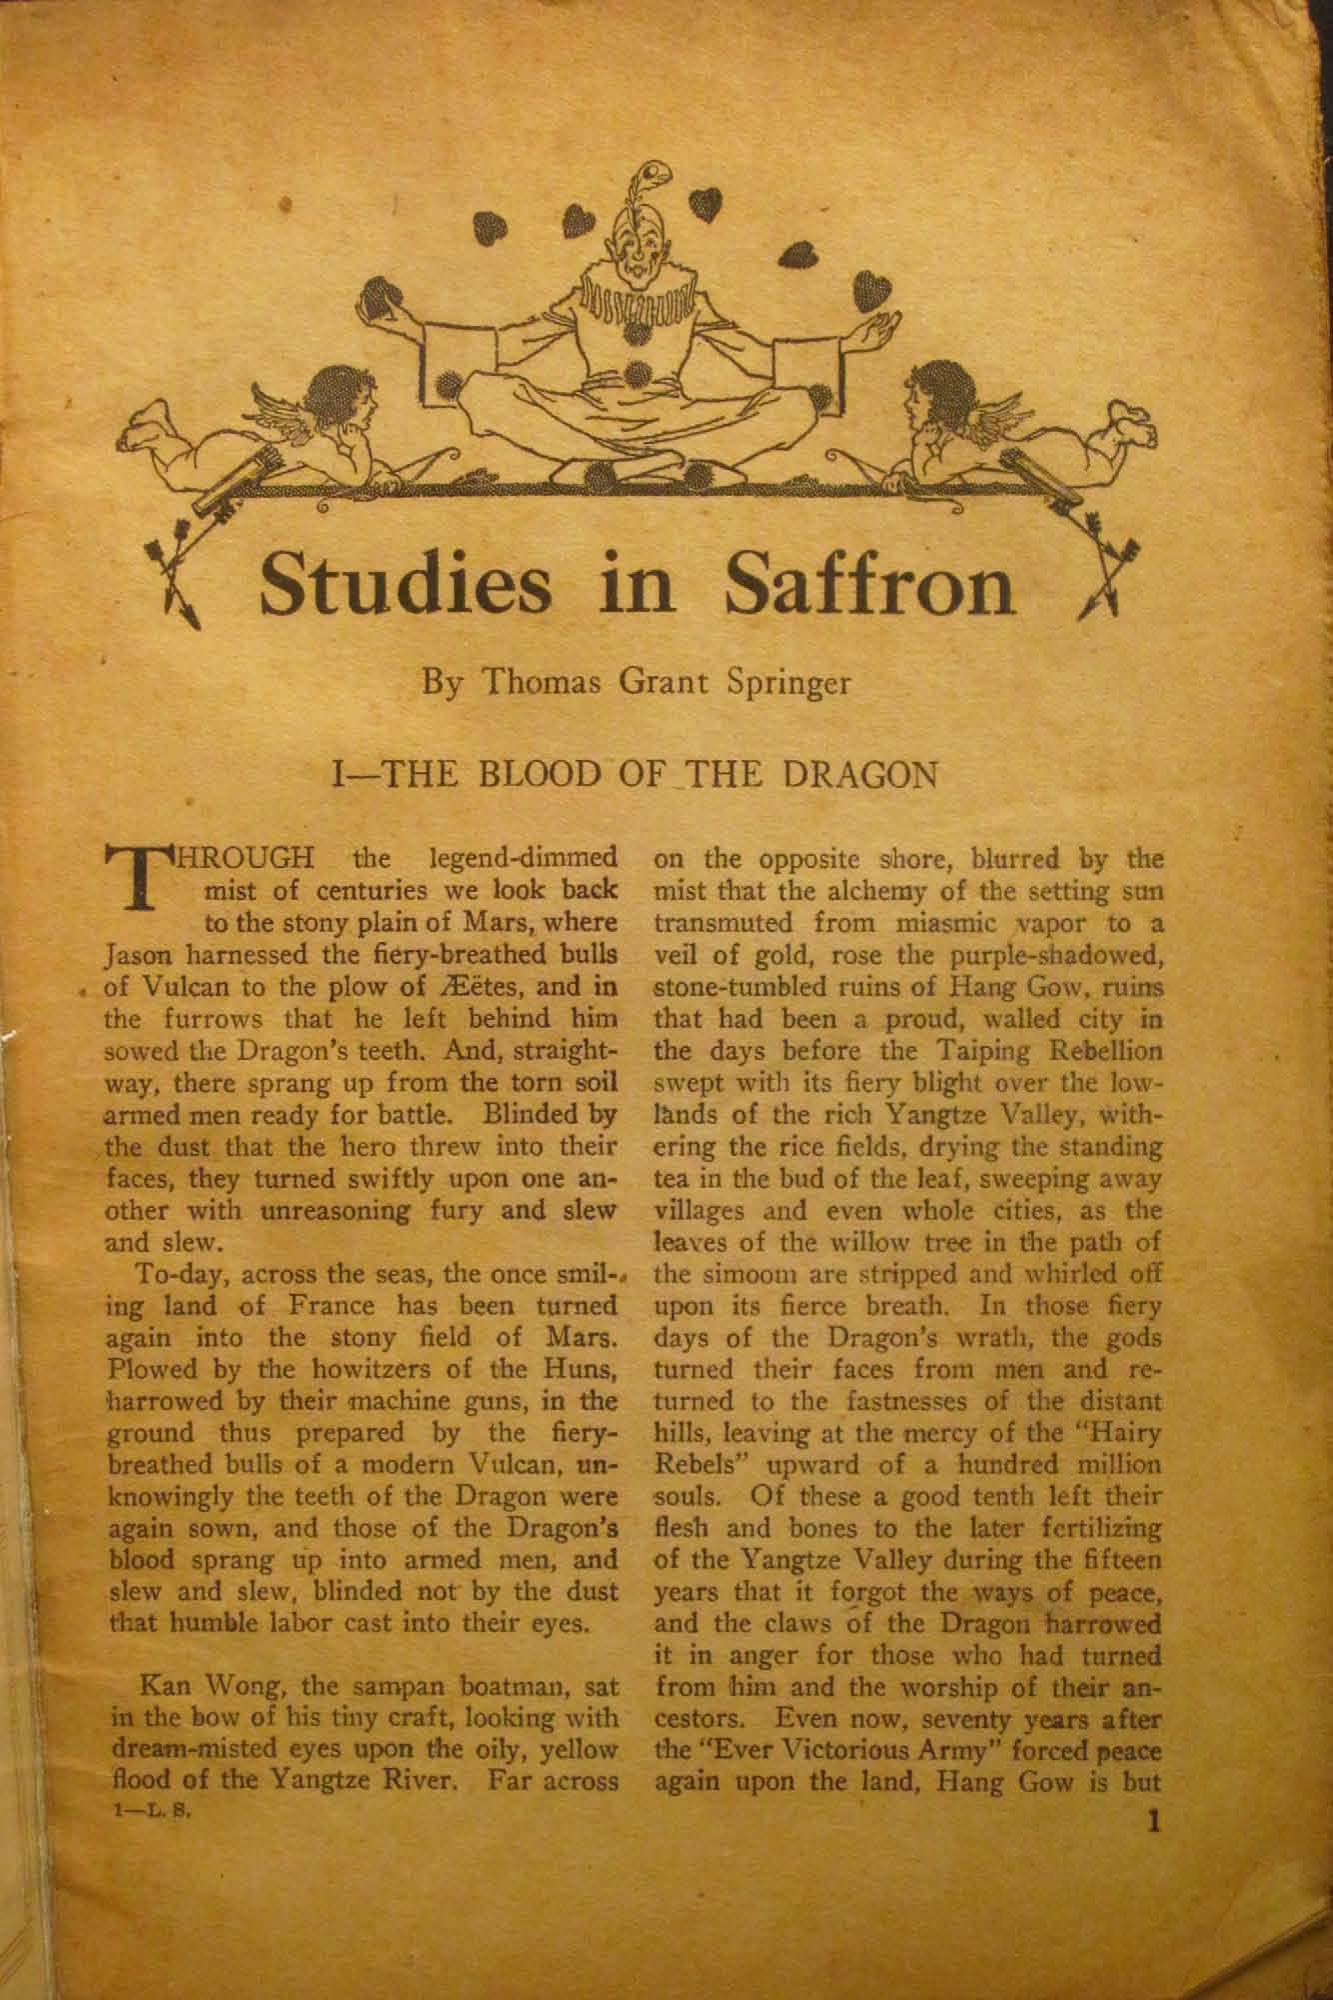 Live Stories Vol  XVIII, No  4 (May 1919), ed  by Grove E  Wilson